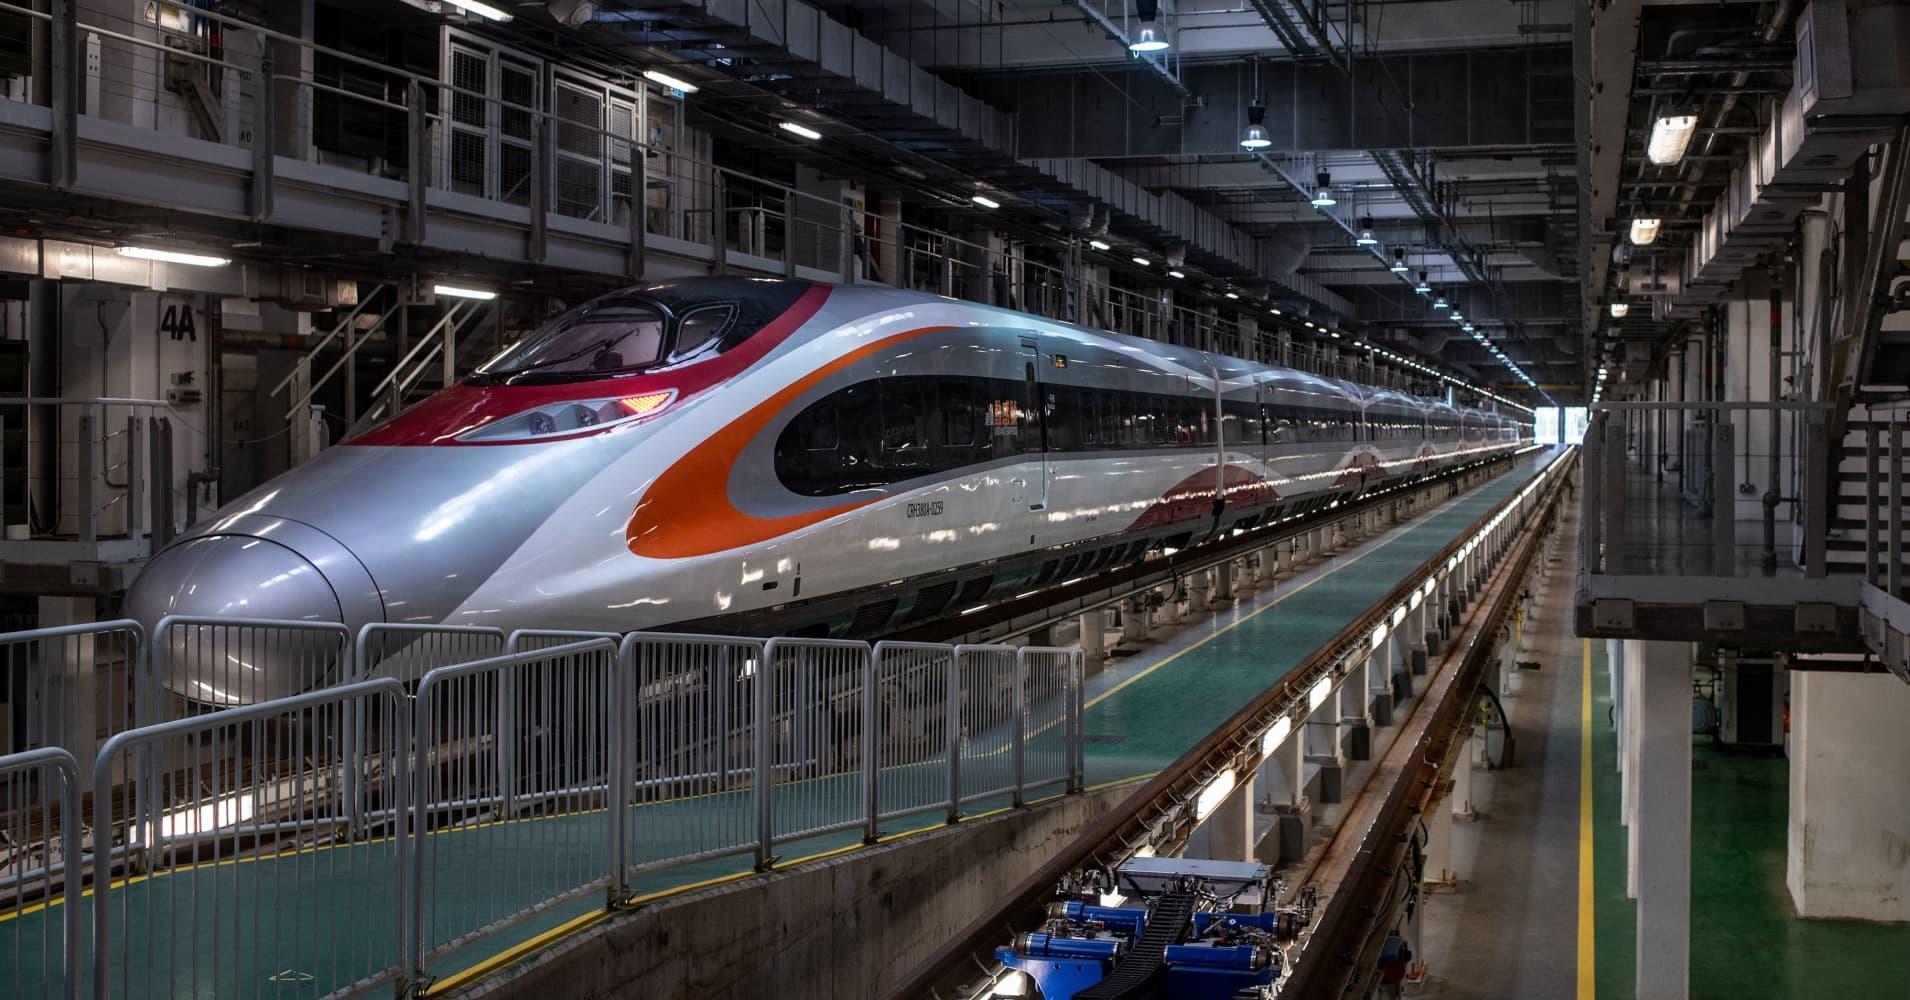 High-speed rail: Train to China brings benefits, worries ...